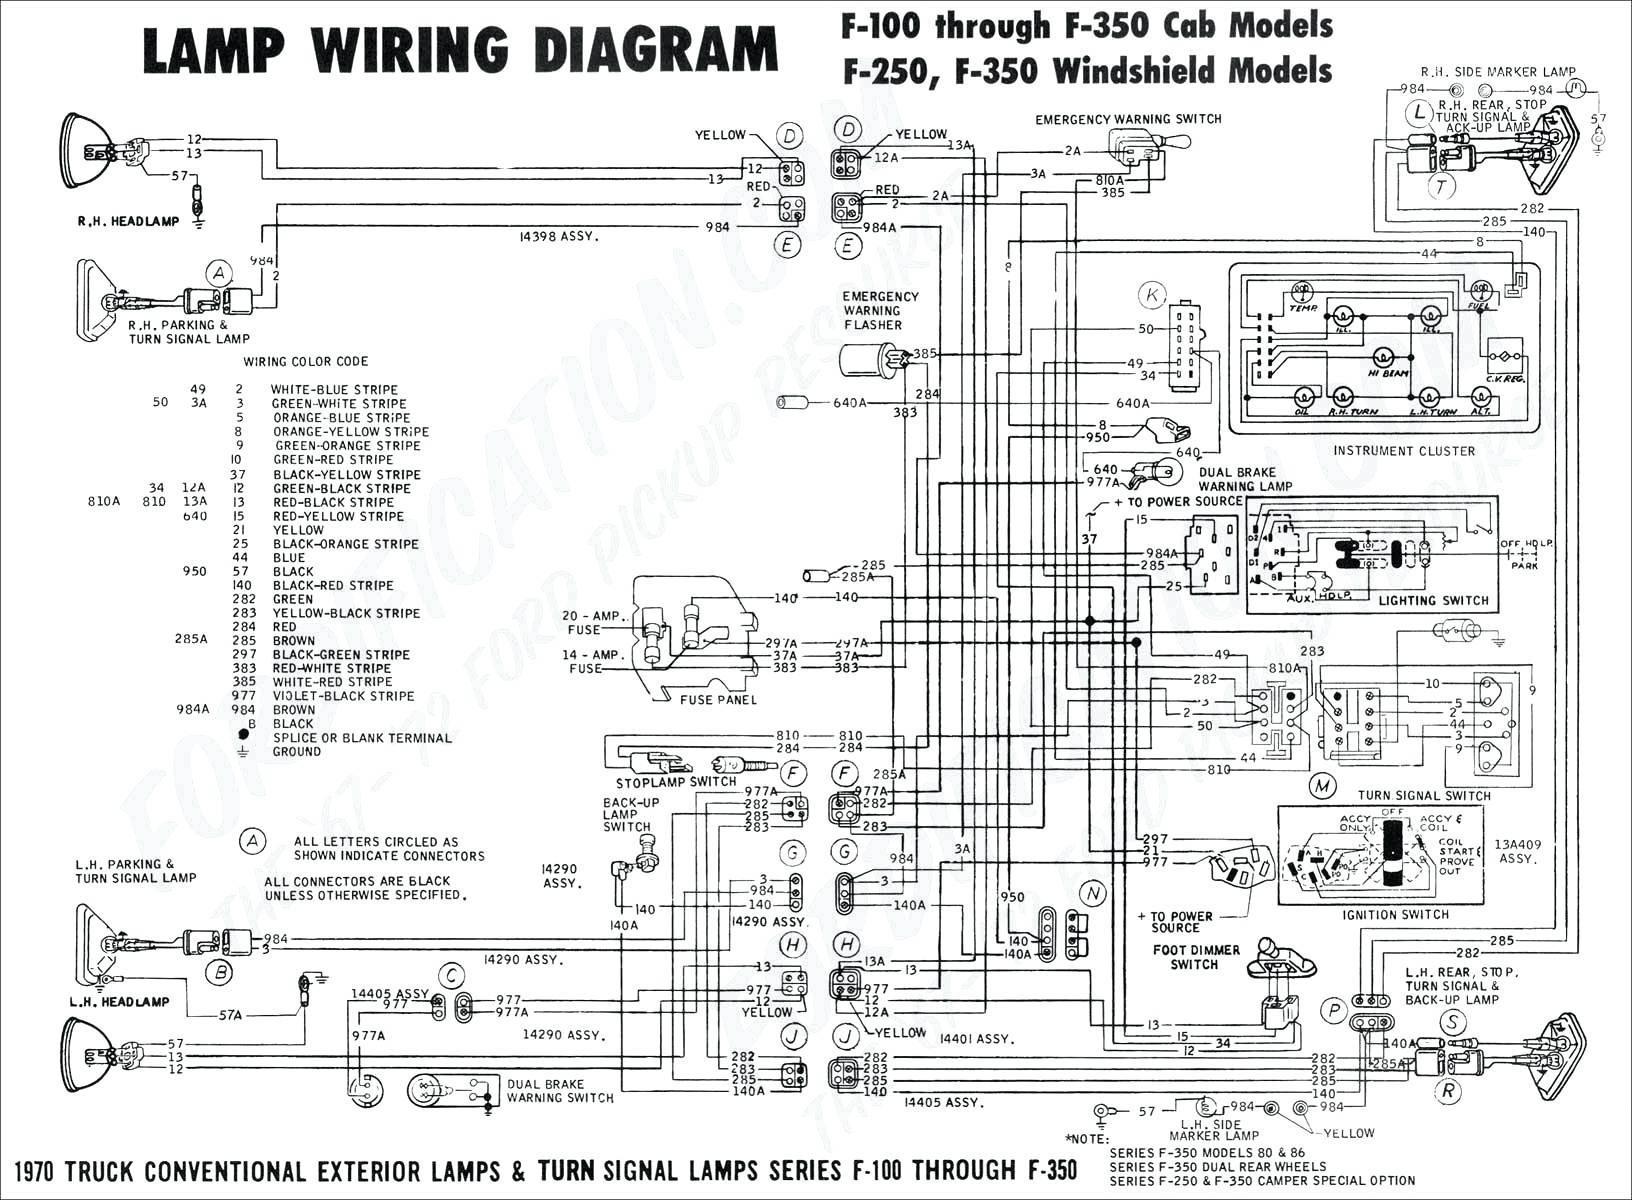 Simple Turn Signal Wiring Diagram Wiring Diagram Ididit Steering Column Simple Wiring Diagram Datasource